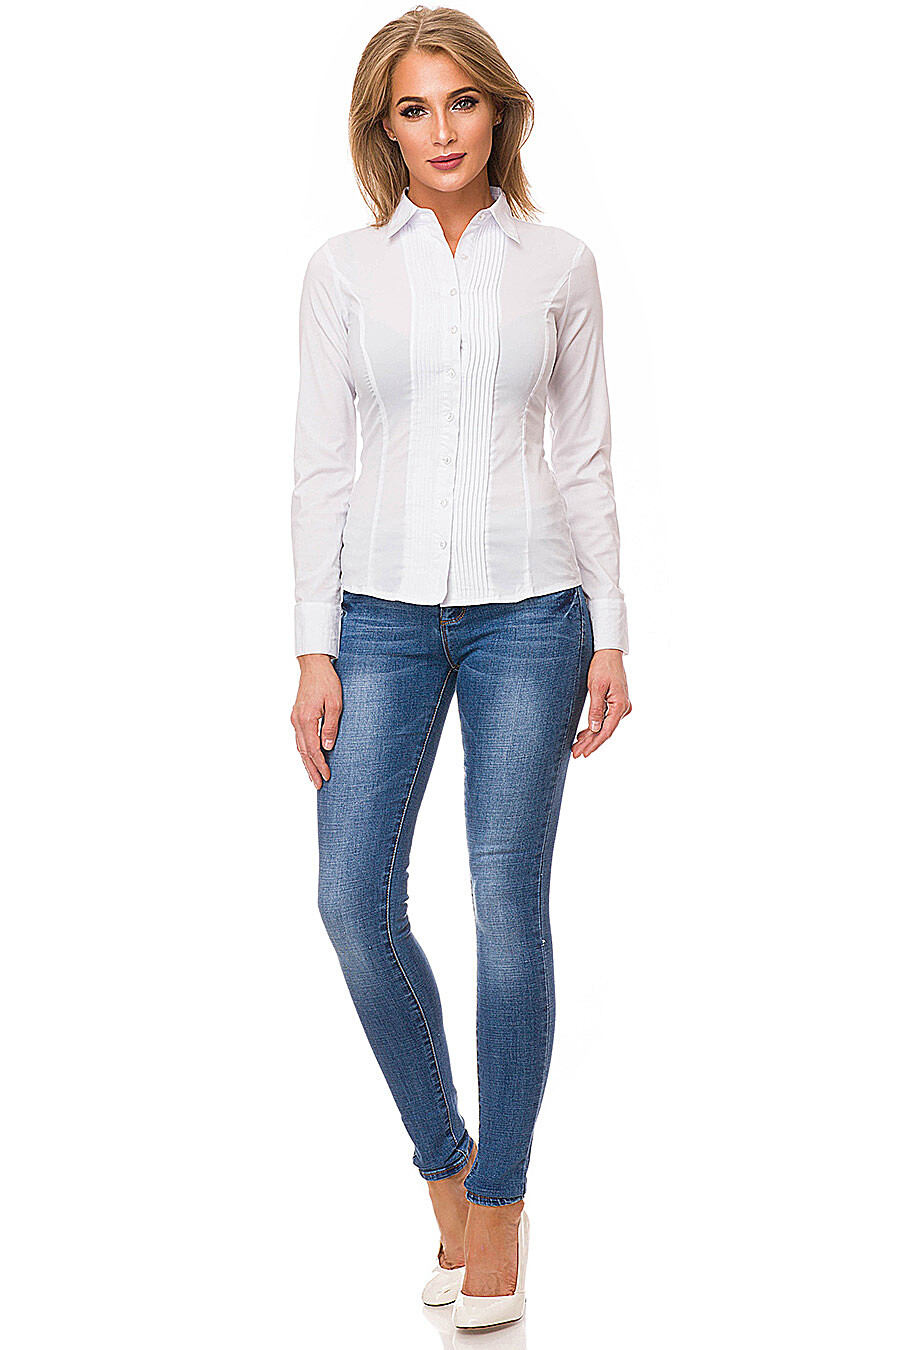 Рубашка MODALIME (86108), купить в Moyo.moda